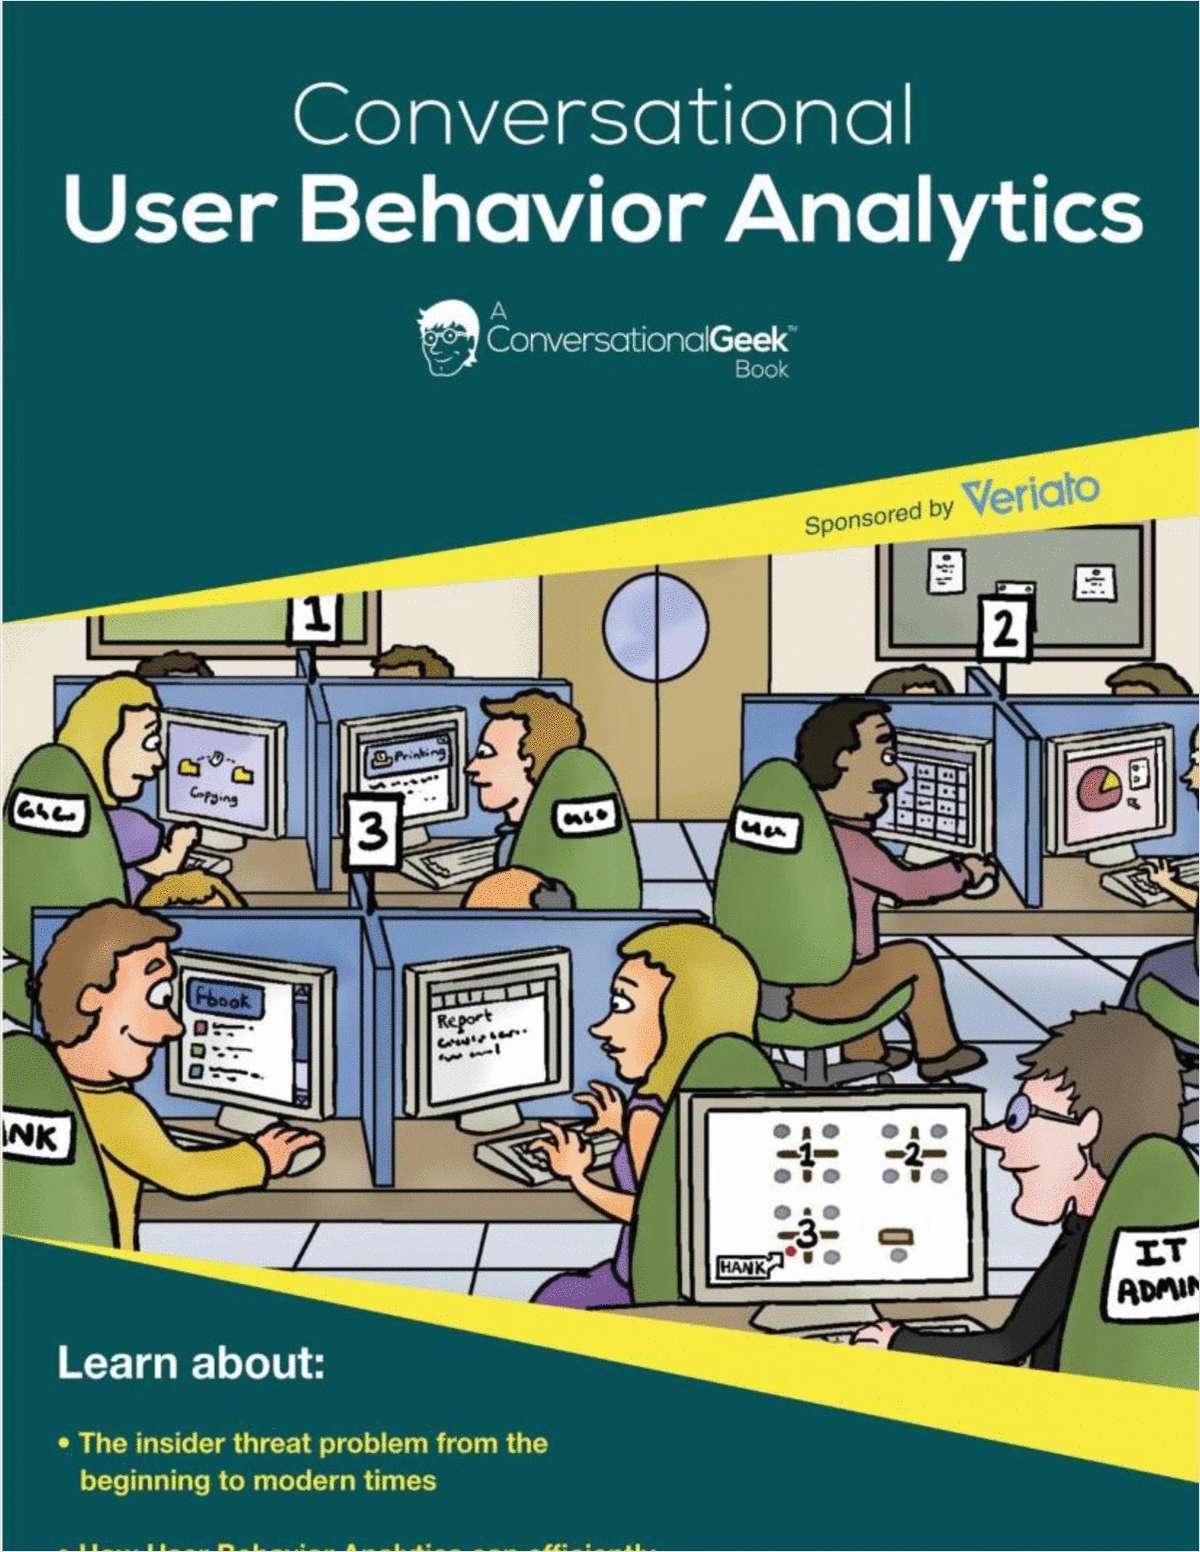 Conversational User Behavior Analytics